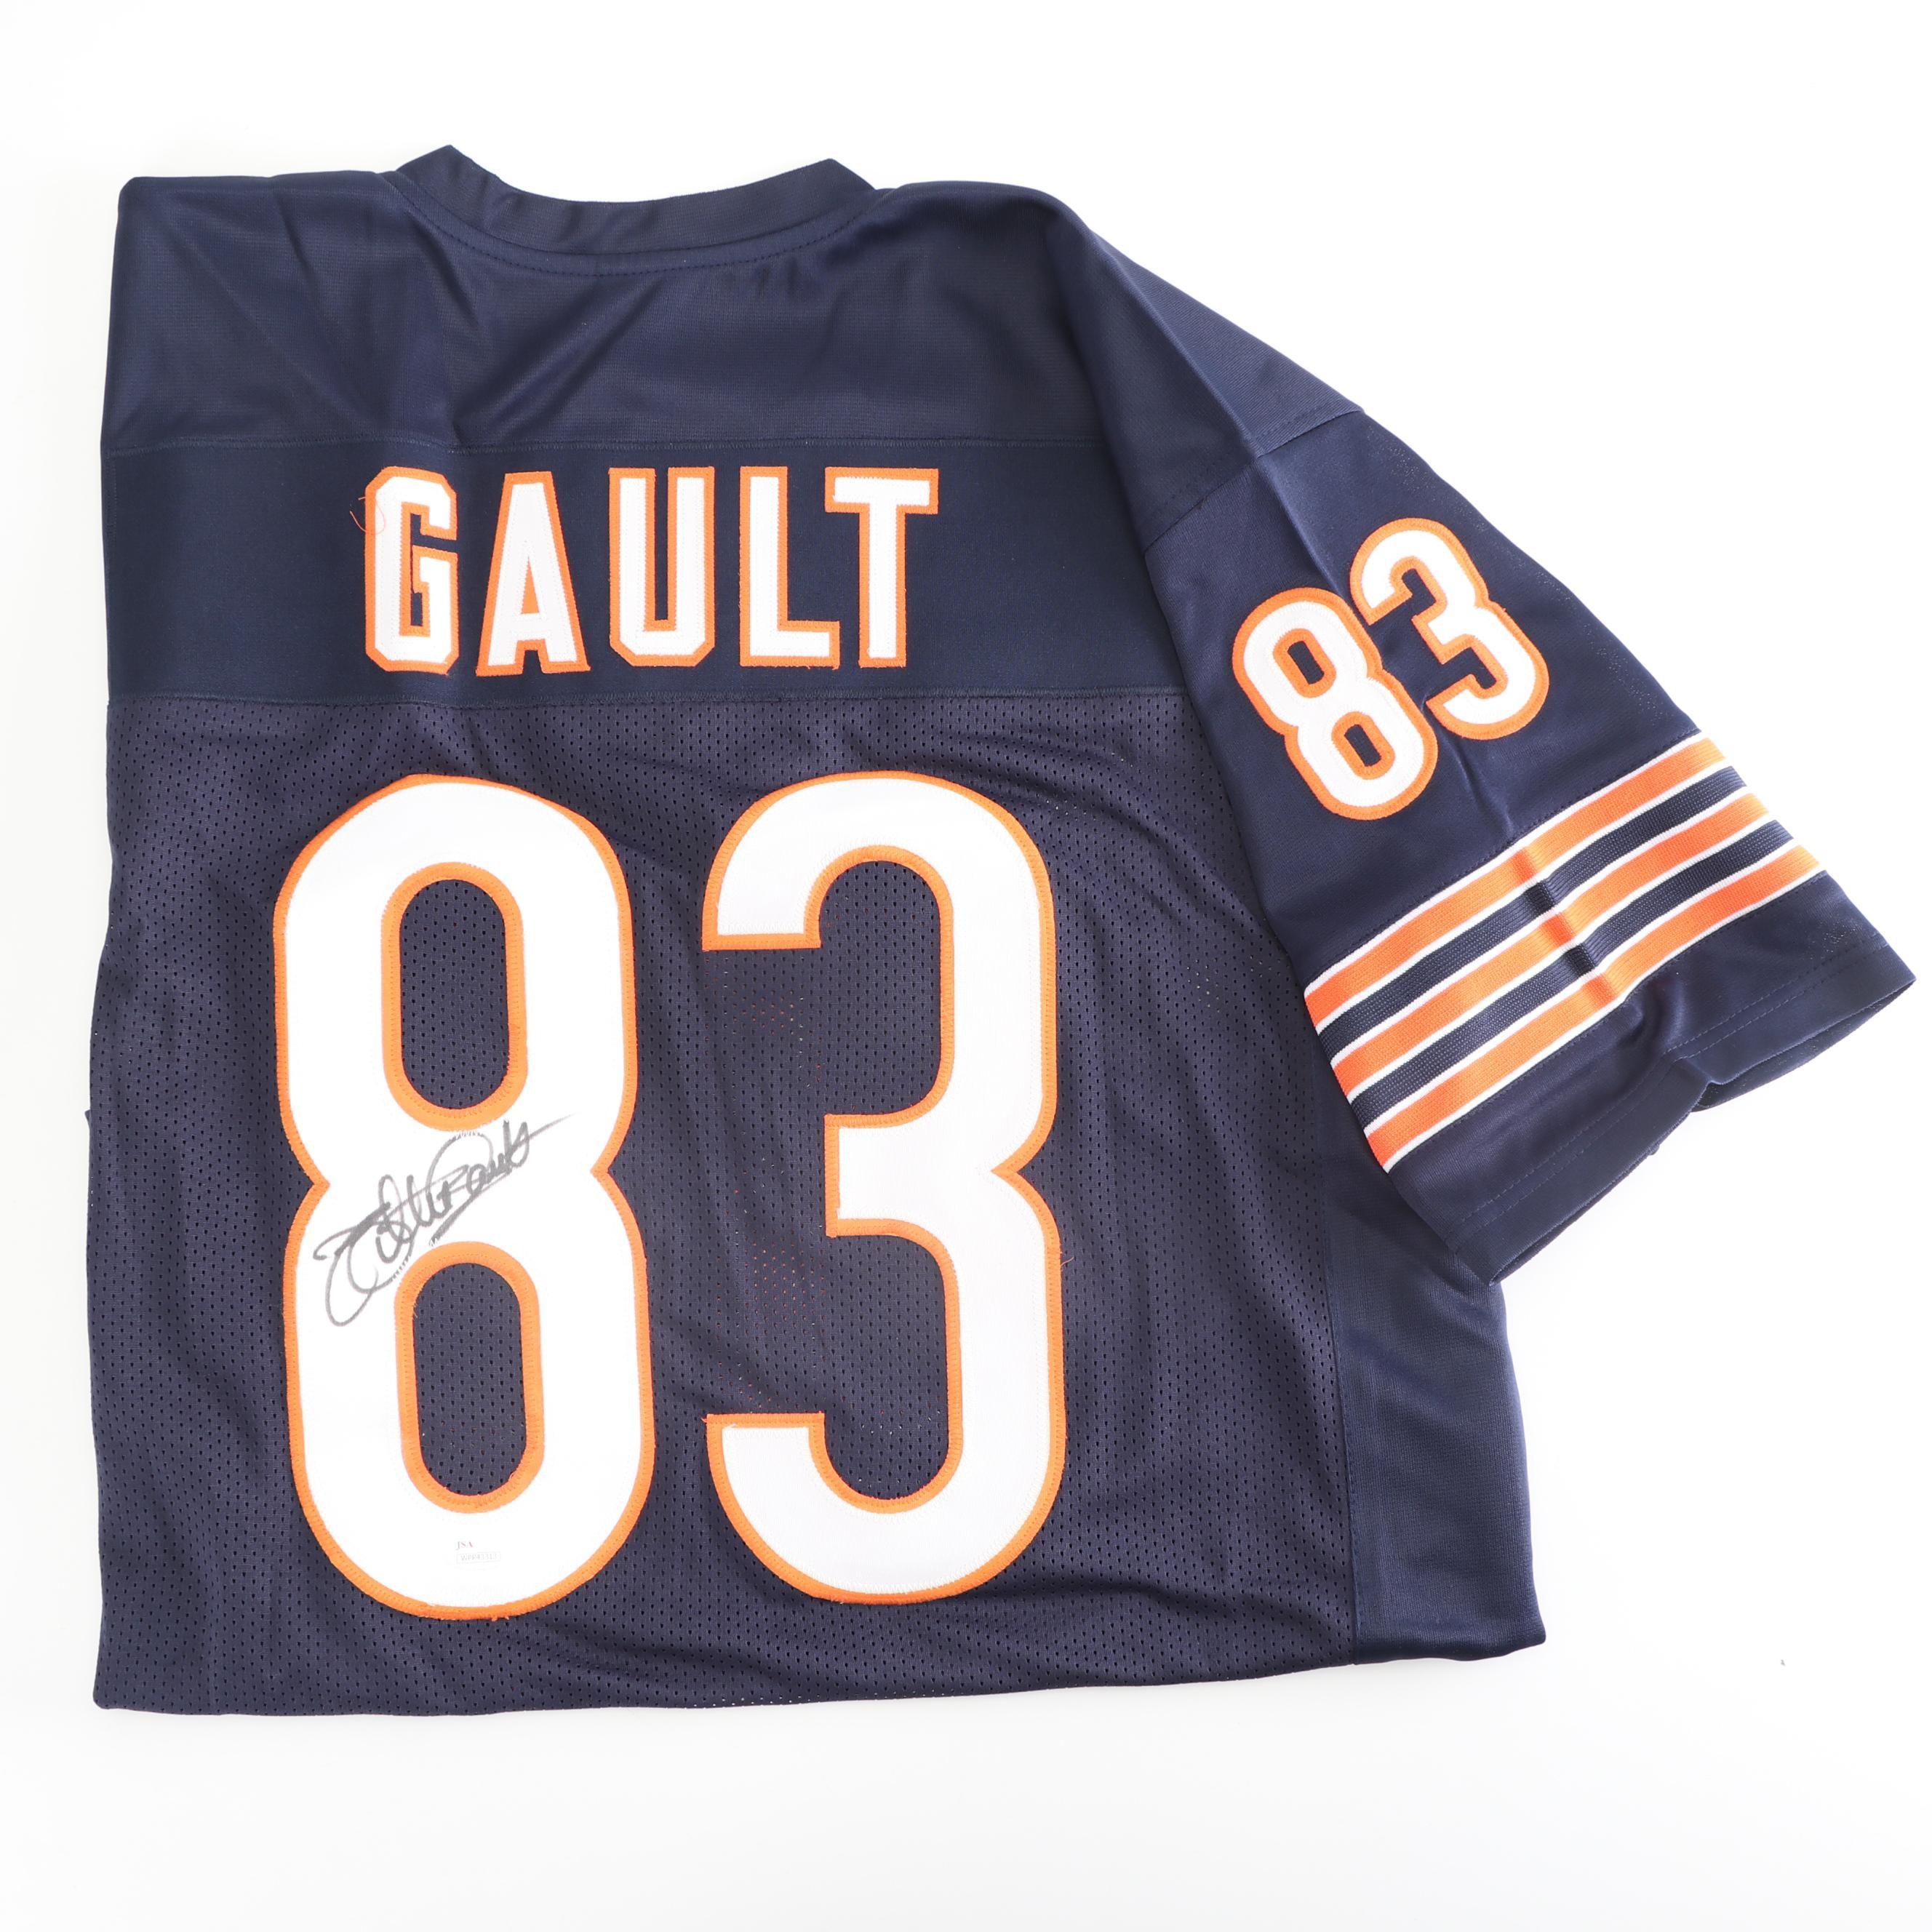 Willie Gault Autographed Chicago Bears Replica Jersey - JSA COA